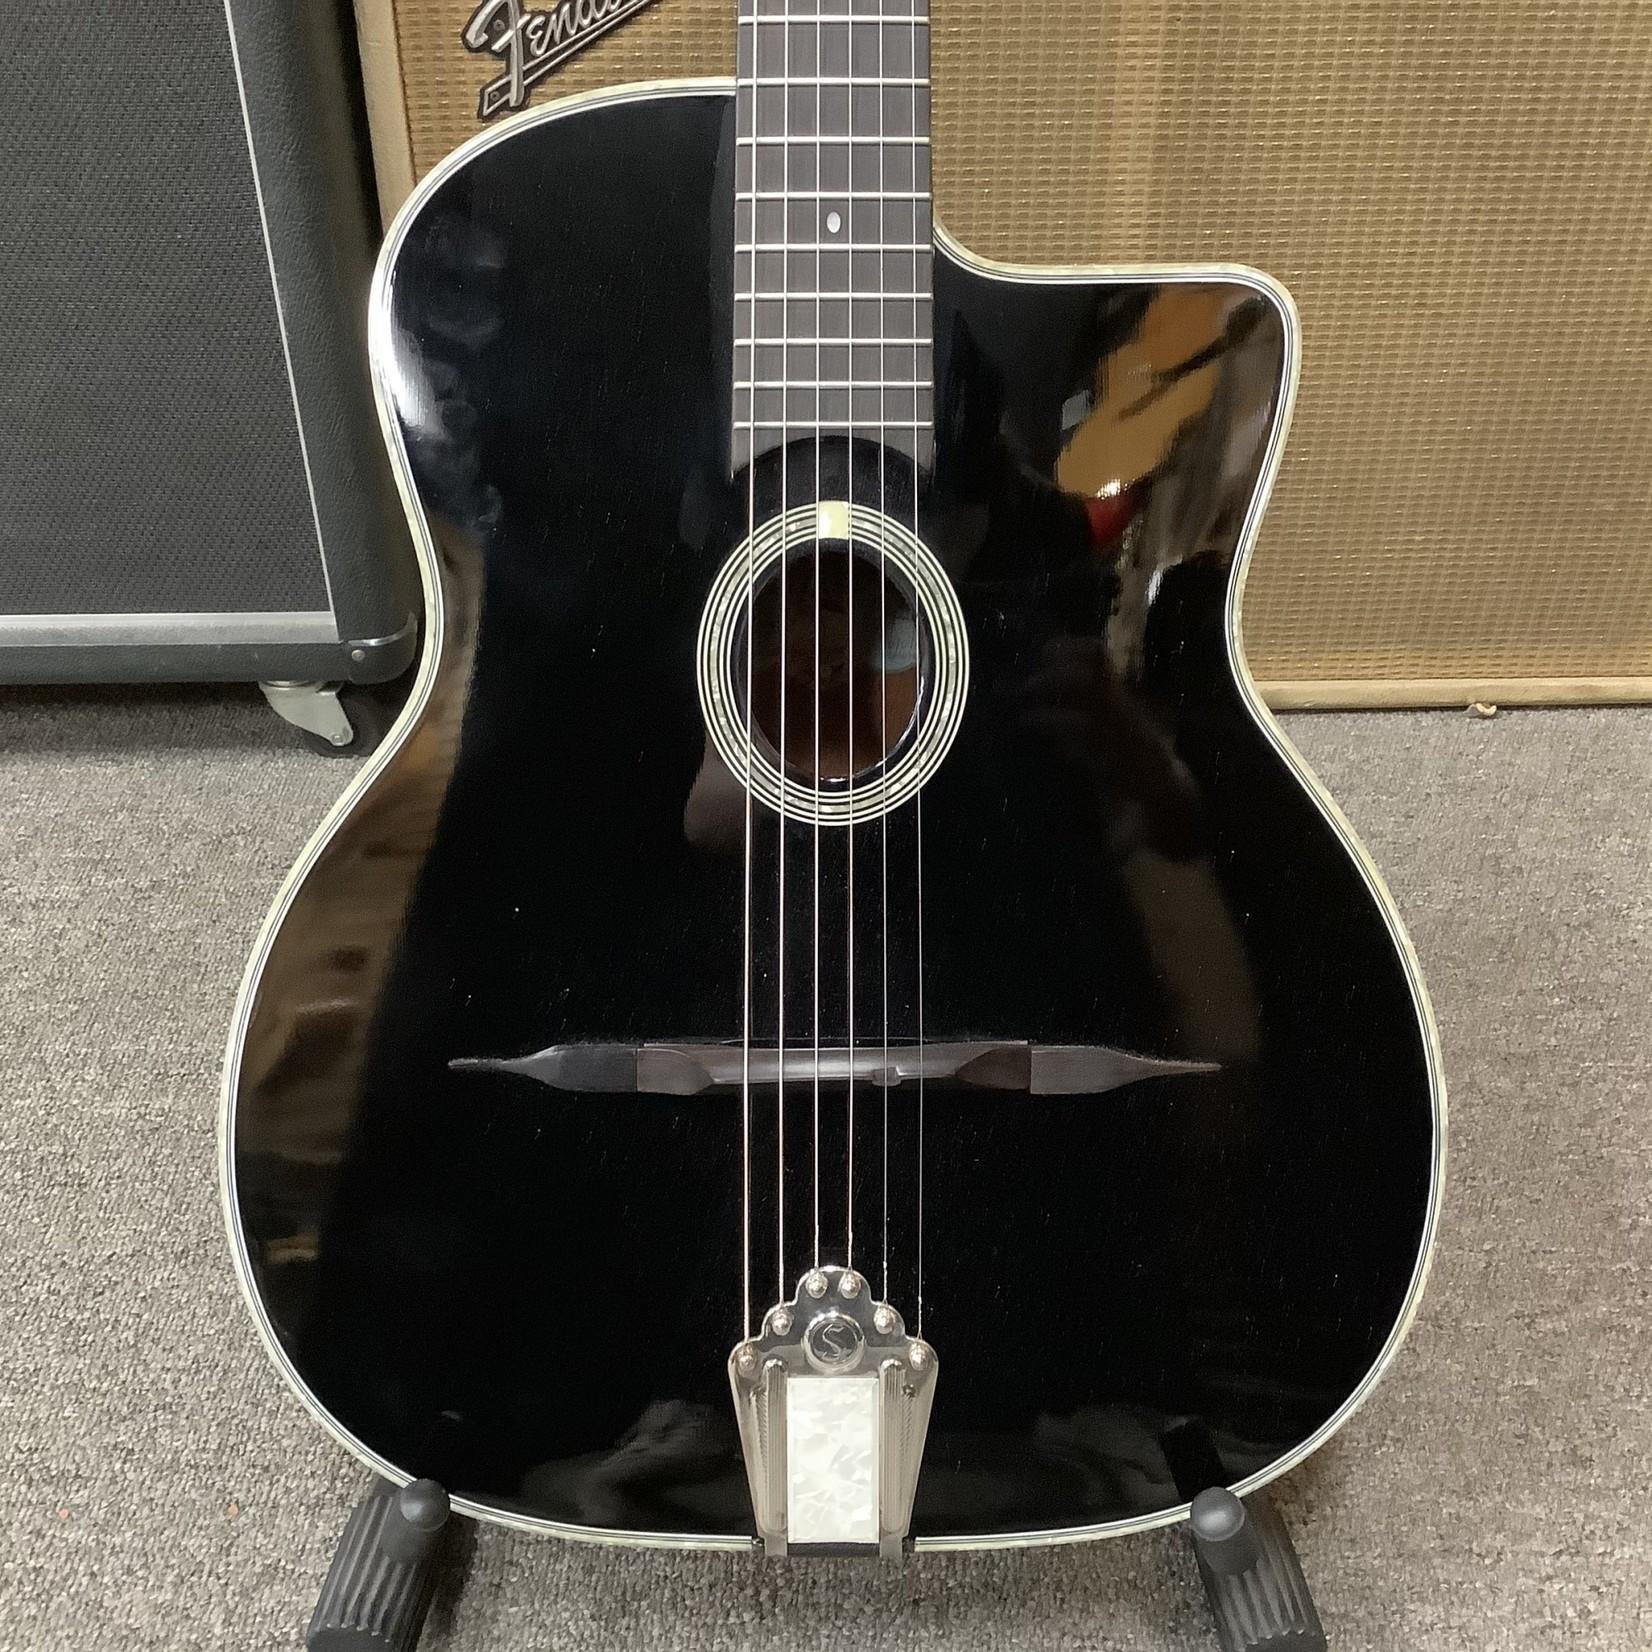 Gitane Gitane Gypsy Jazz DG-330 John Jorgenson Model